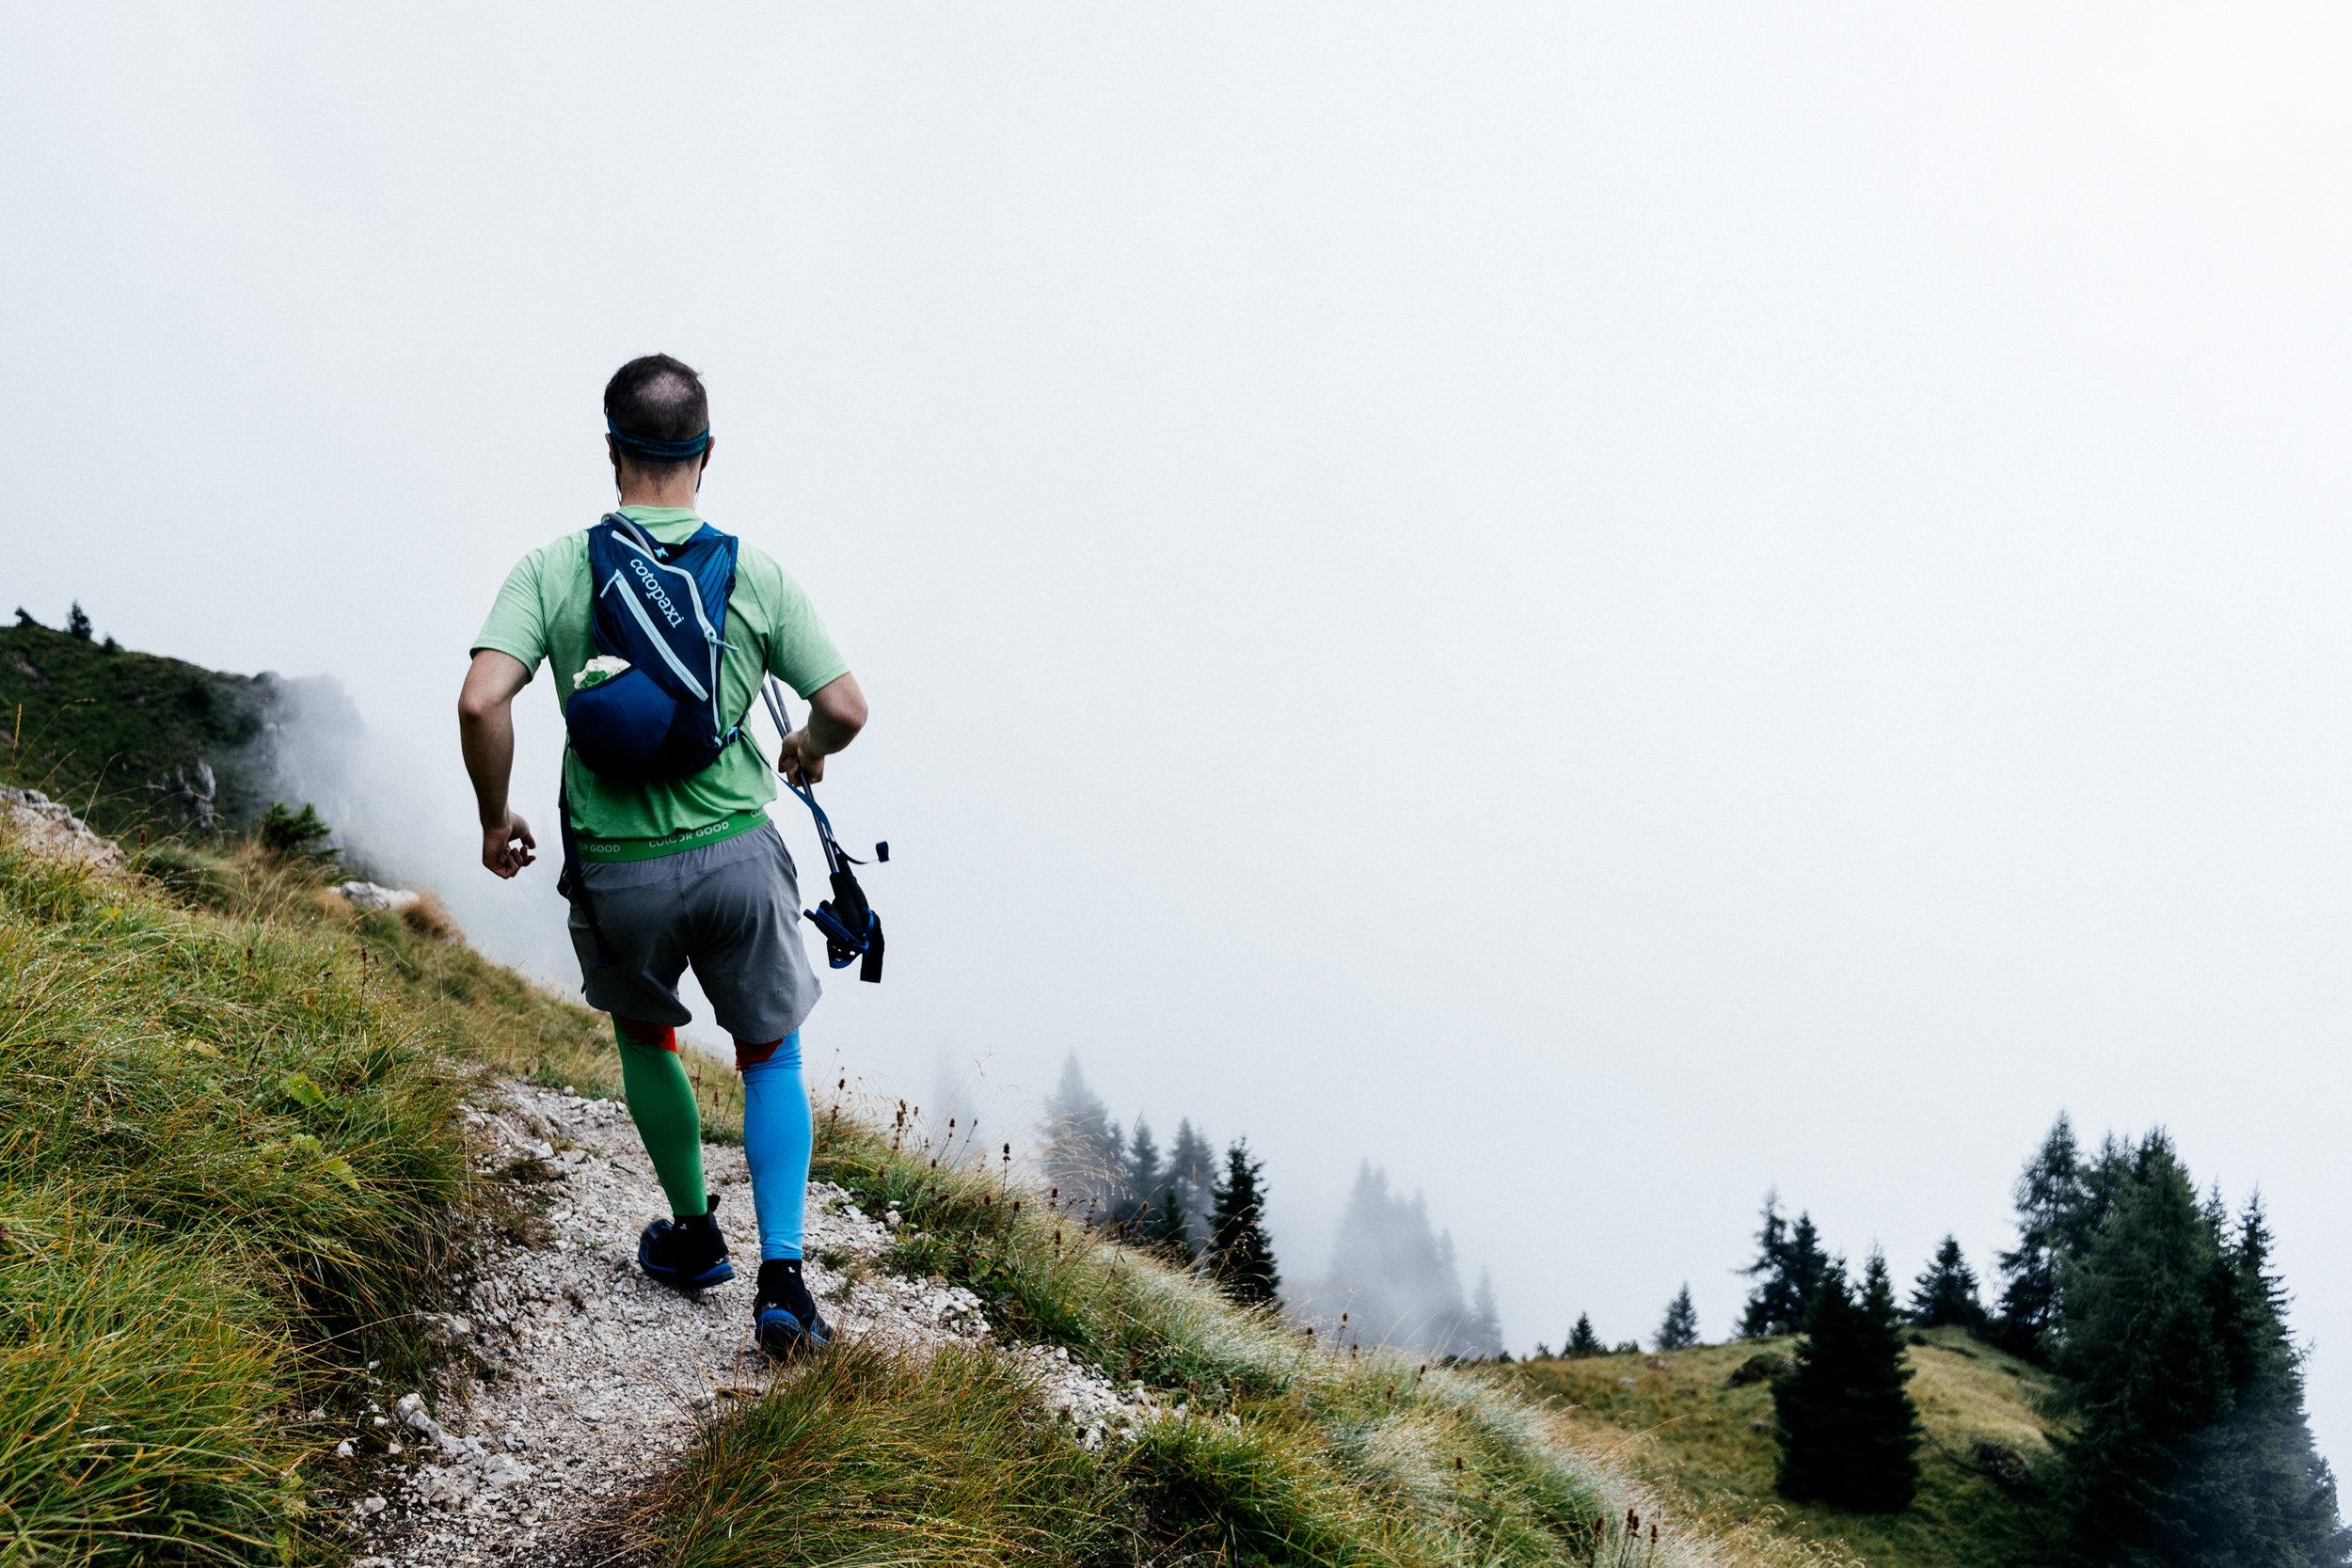 Dolomites-ChrisBrinleeJr-SEP17-40.jpg